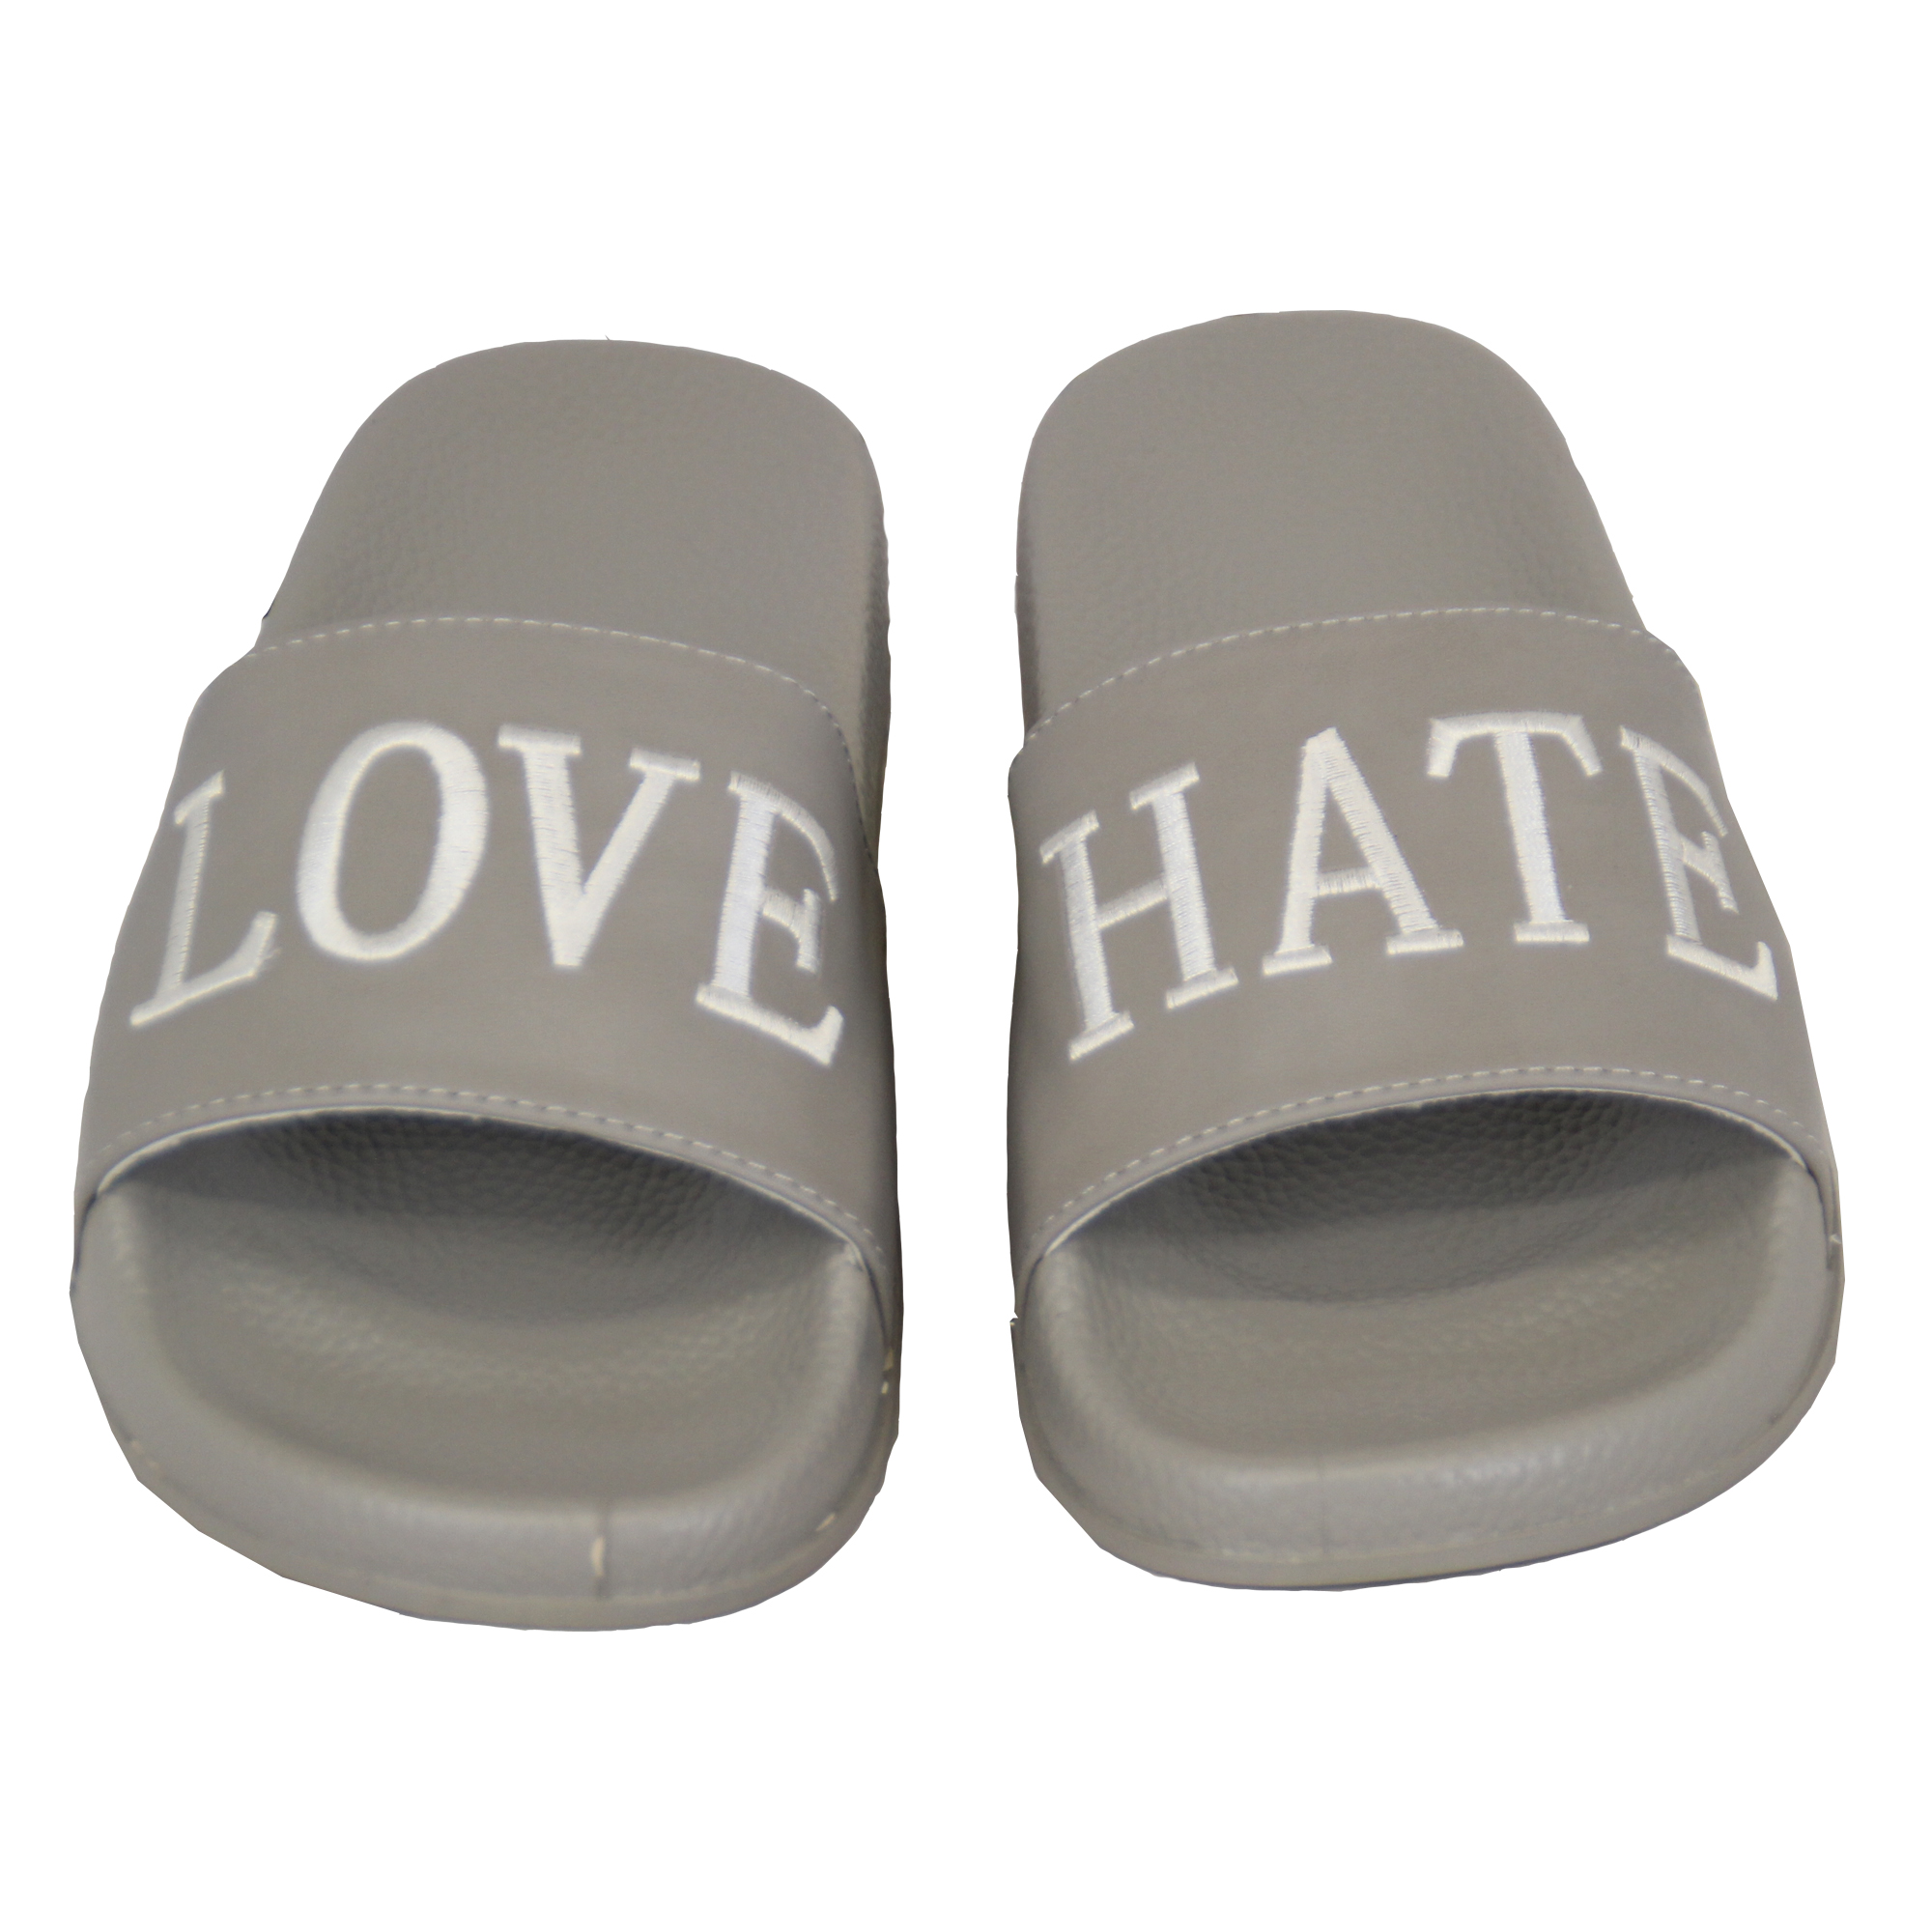 Ladies-Flat-Sliders-Love-Hate-Slippers-Slip-On-Mules-Womens-Summer-Sandals-Shoes